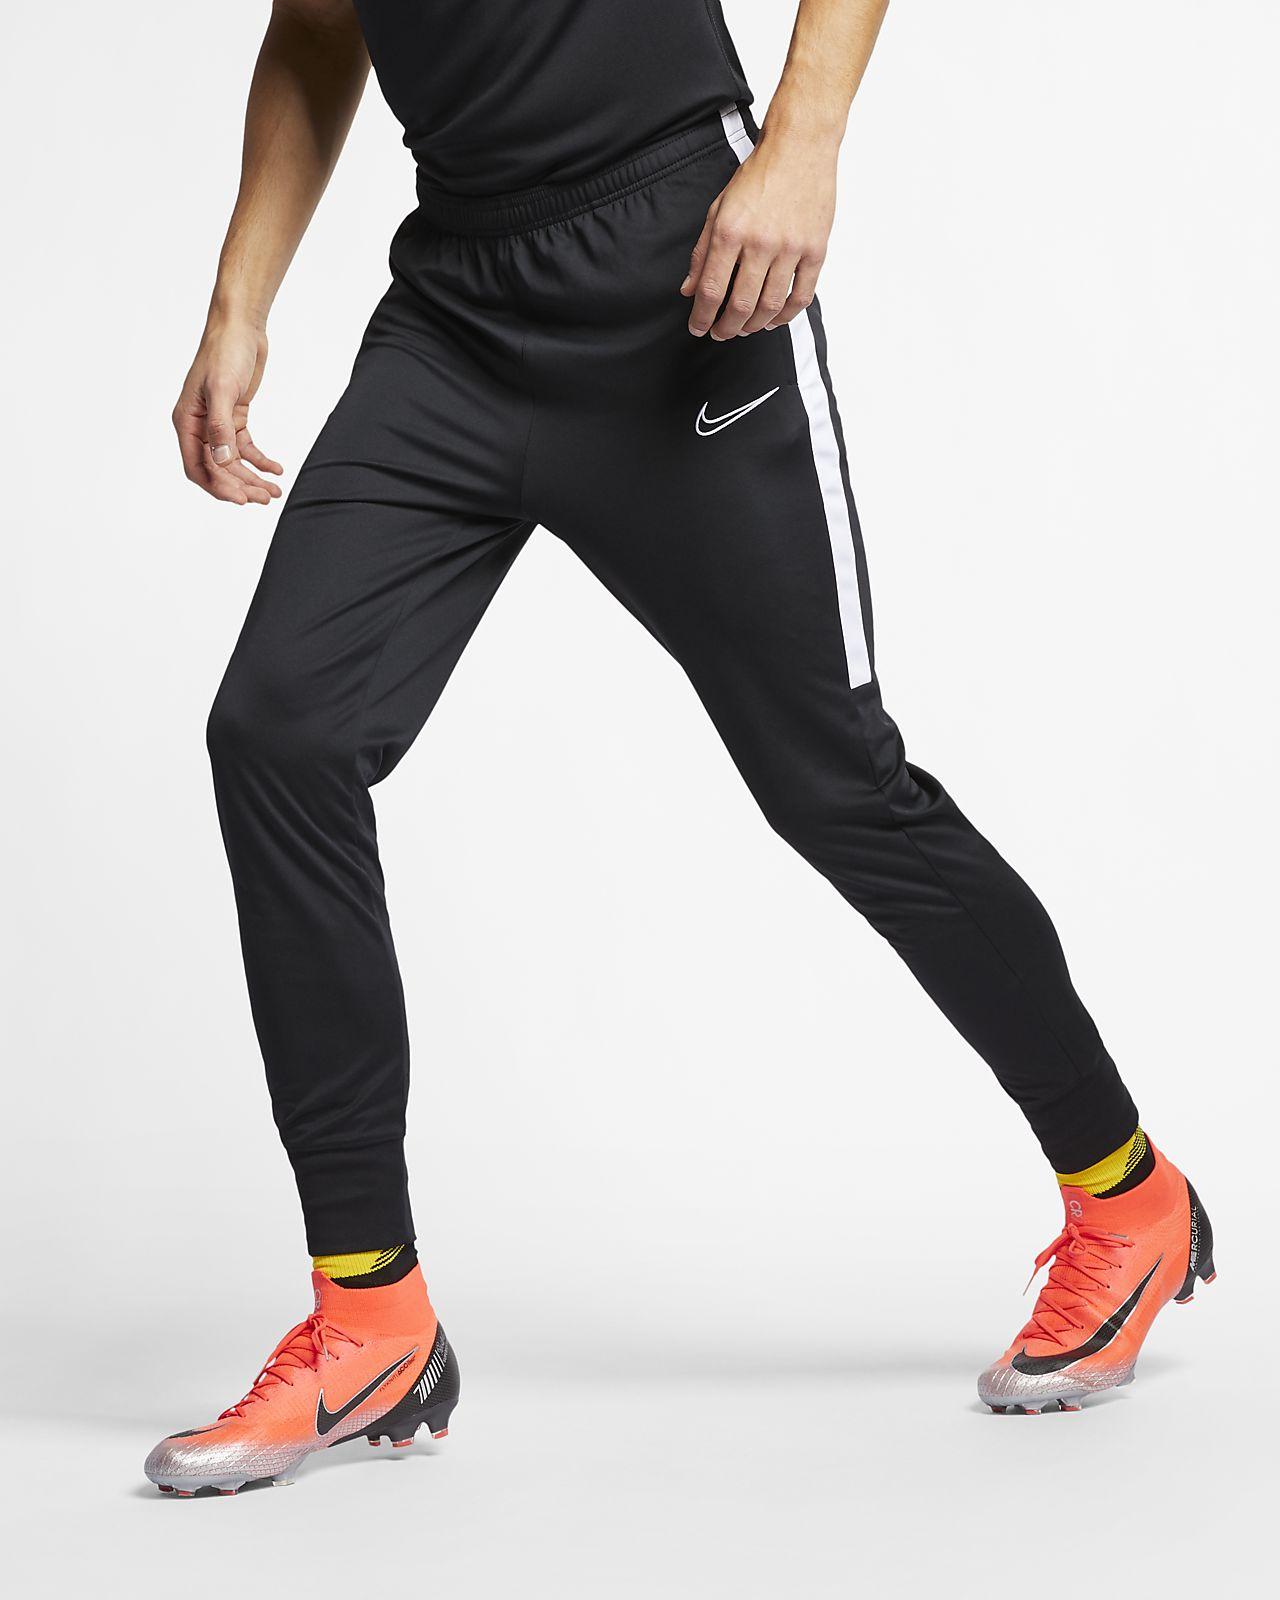 3d6bbac9c306 Nike Dri-FIT Academy Men s Football Pants. Nike.com NO